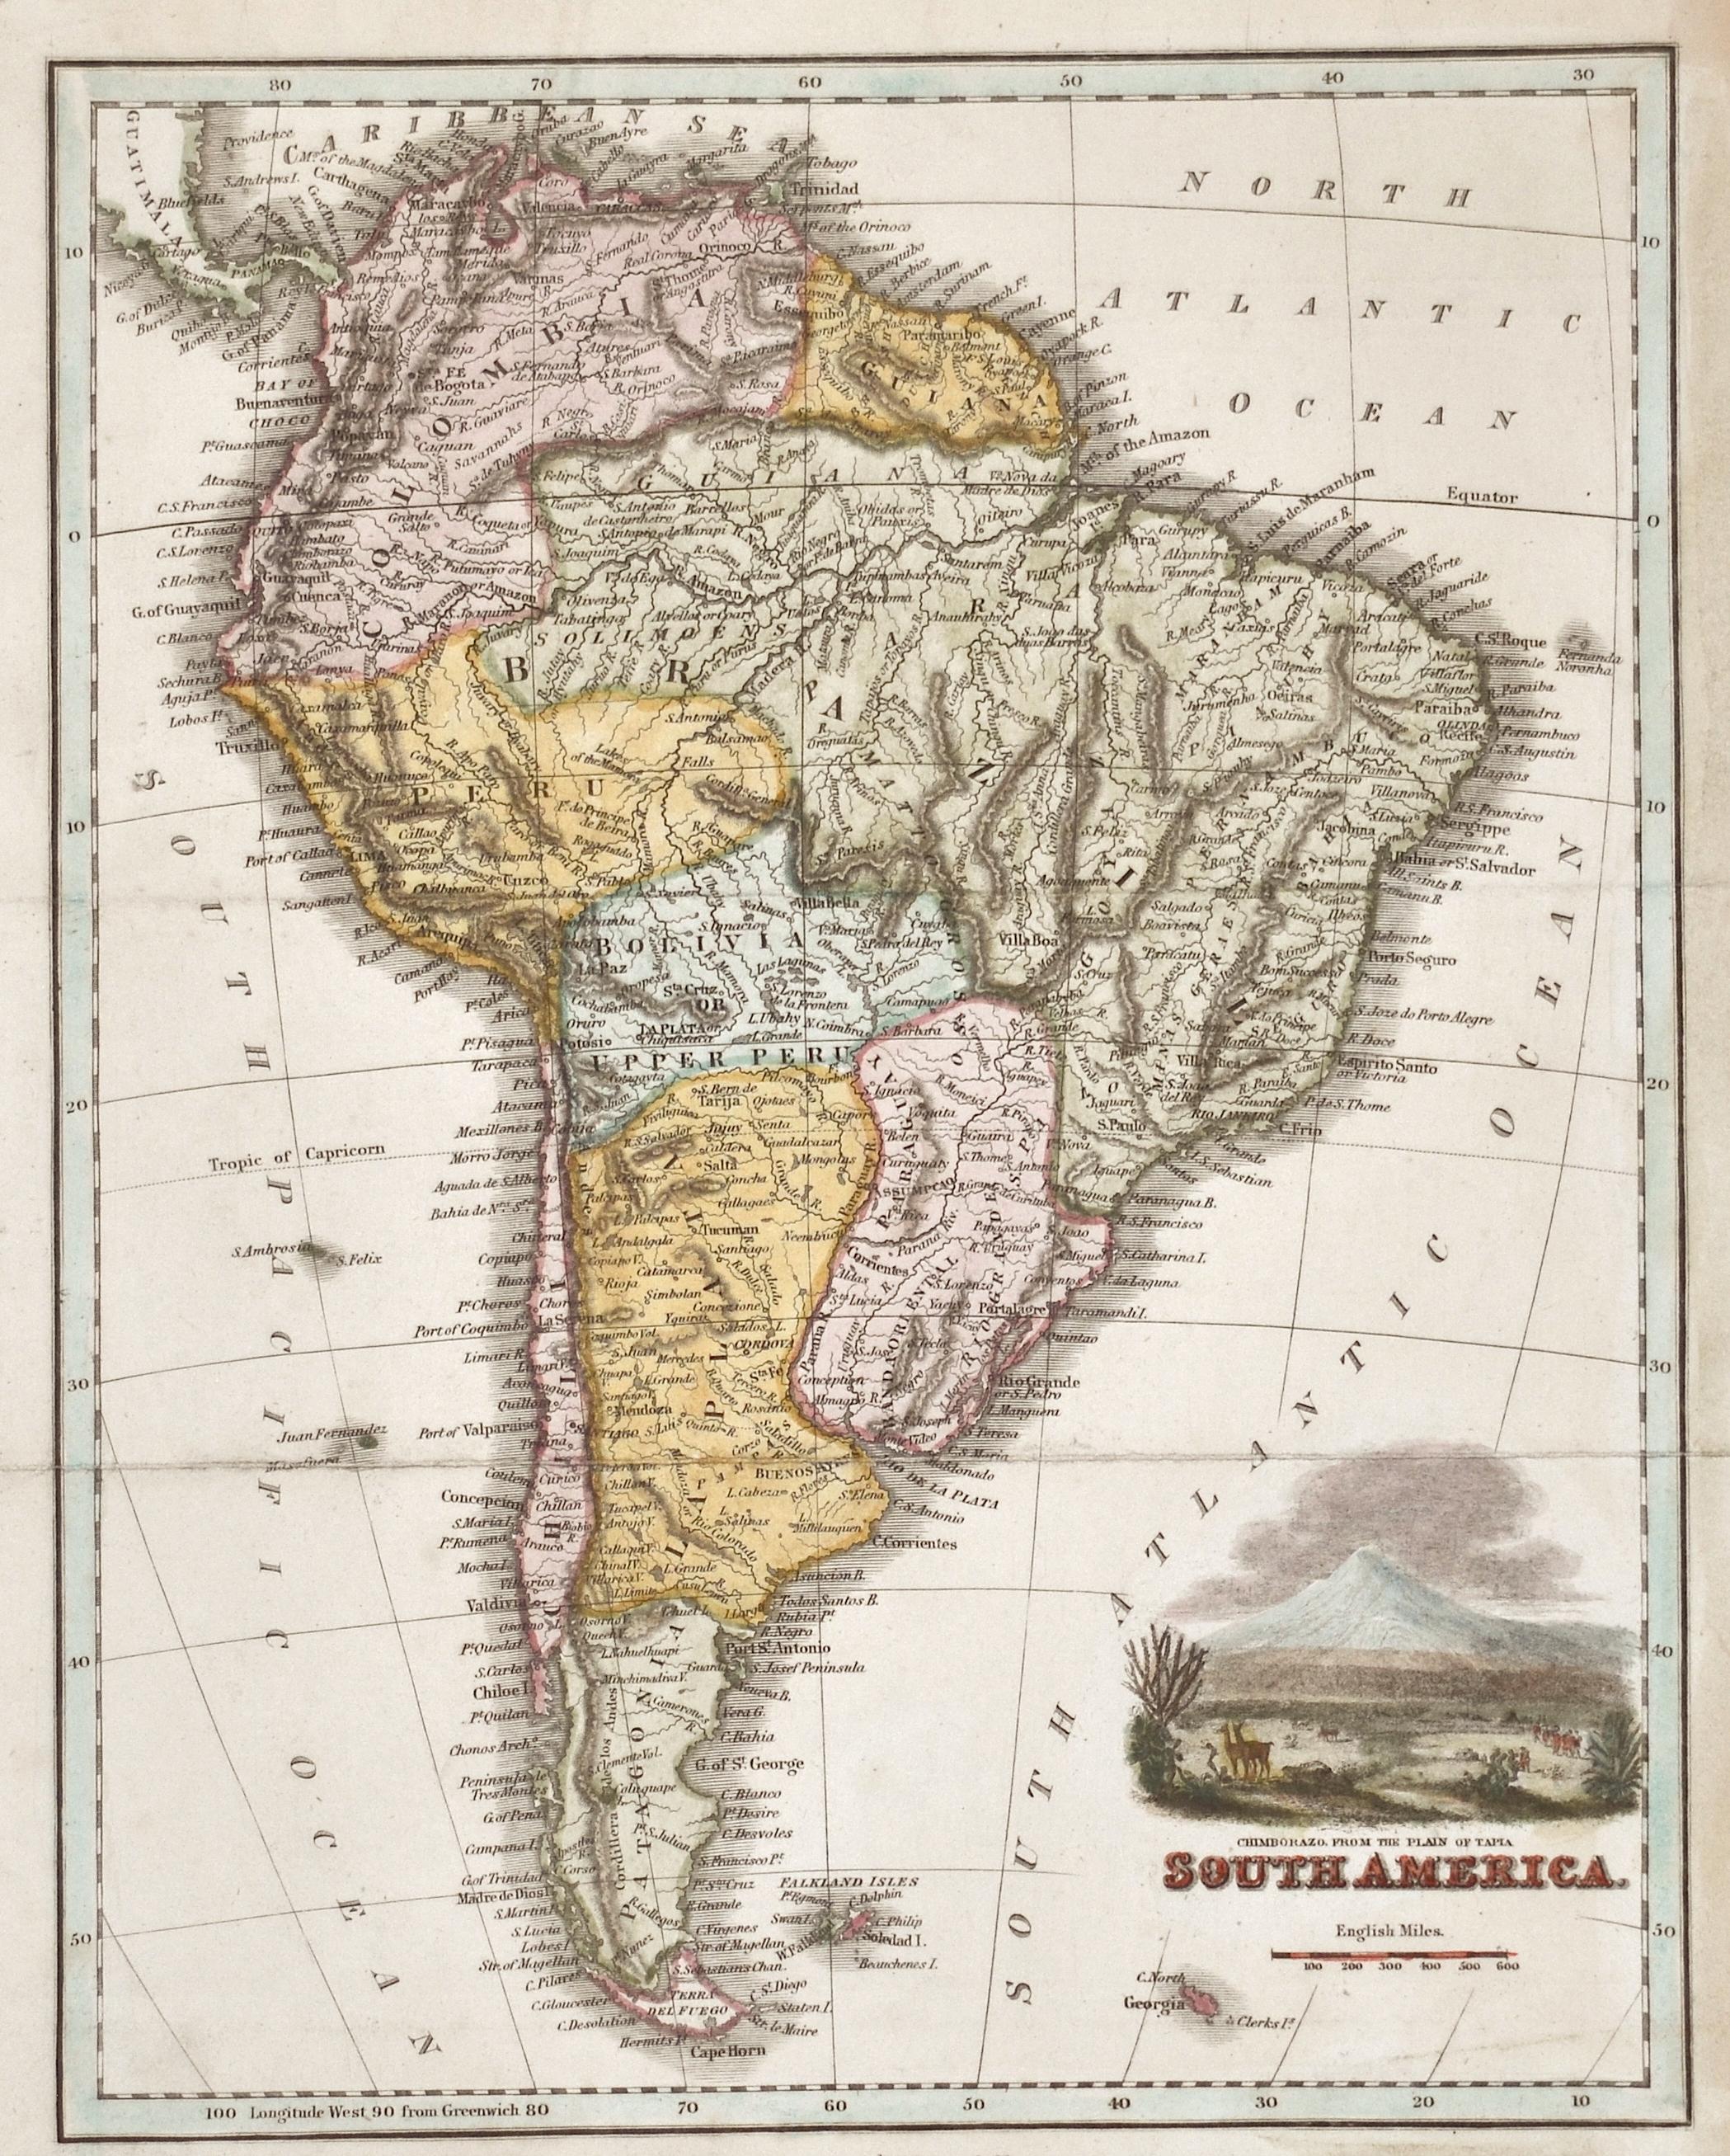 Fullarton & Co  South America.